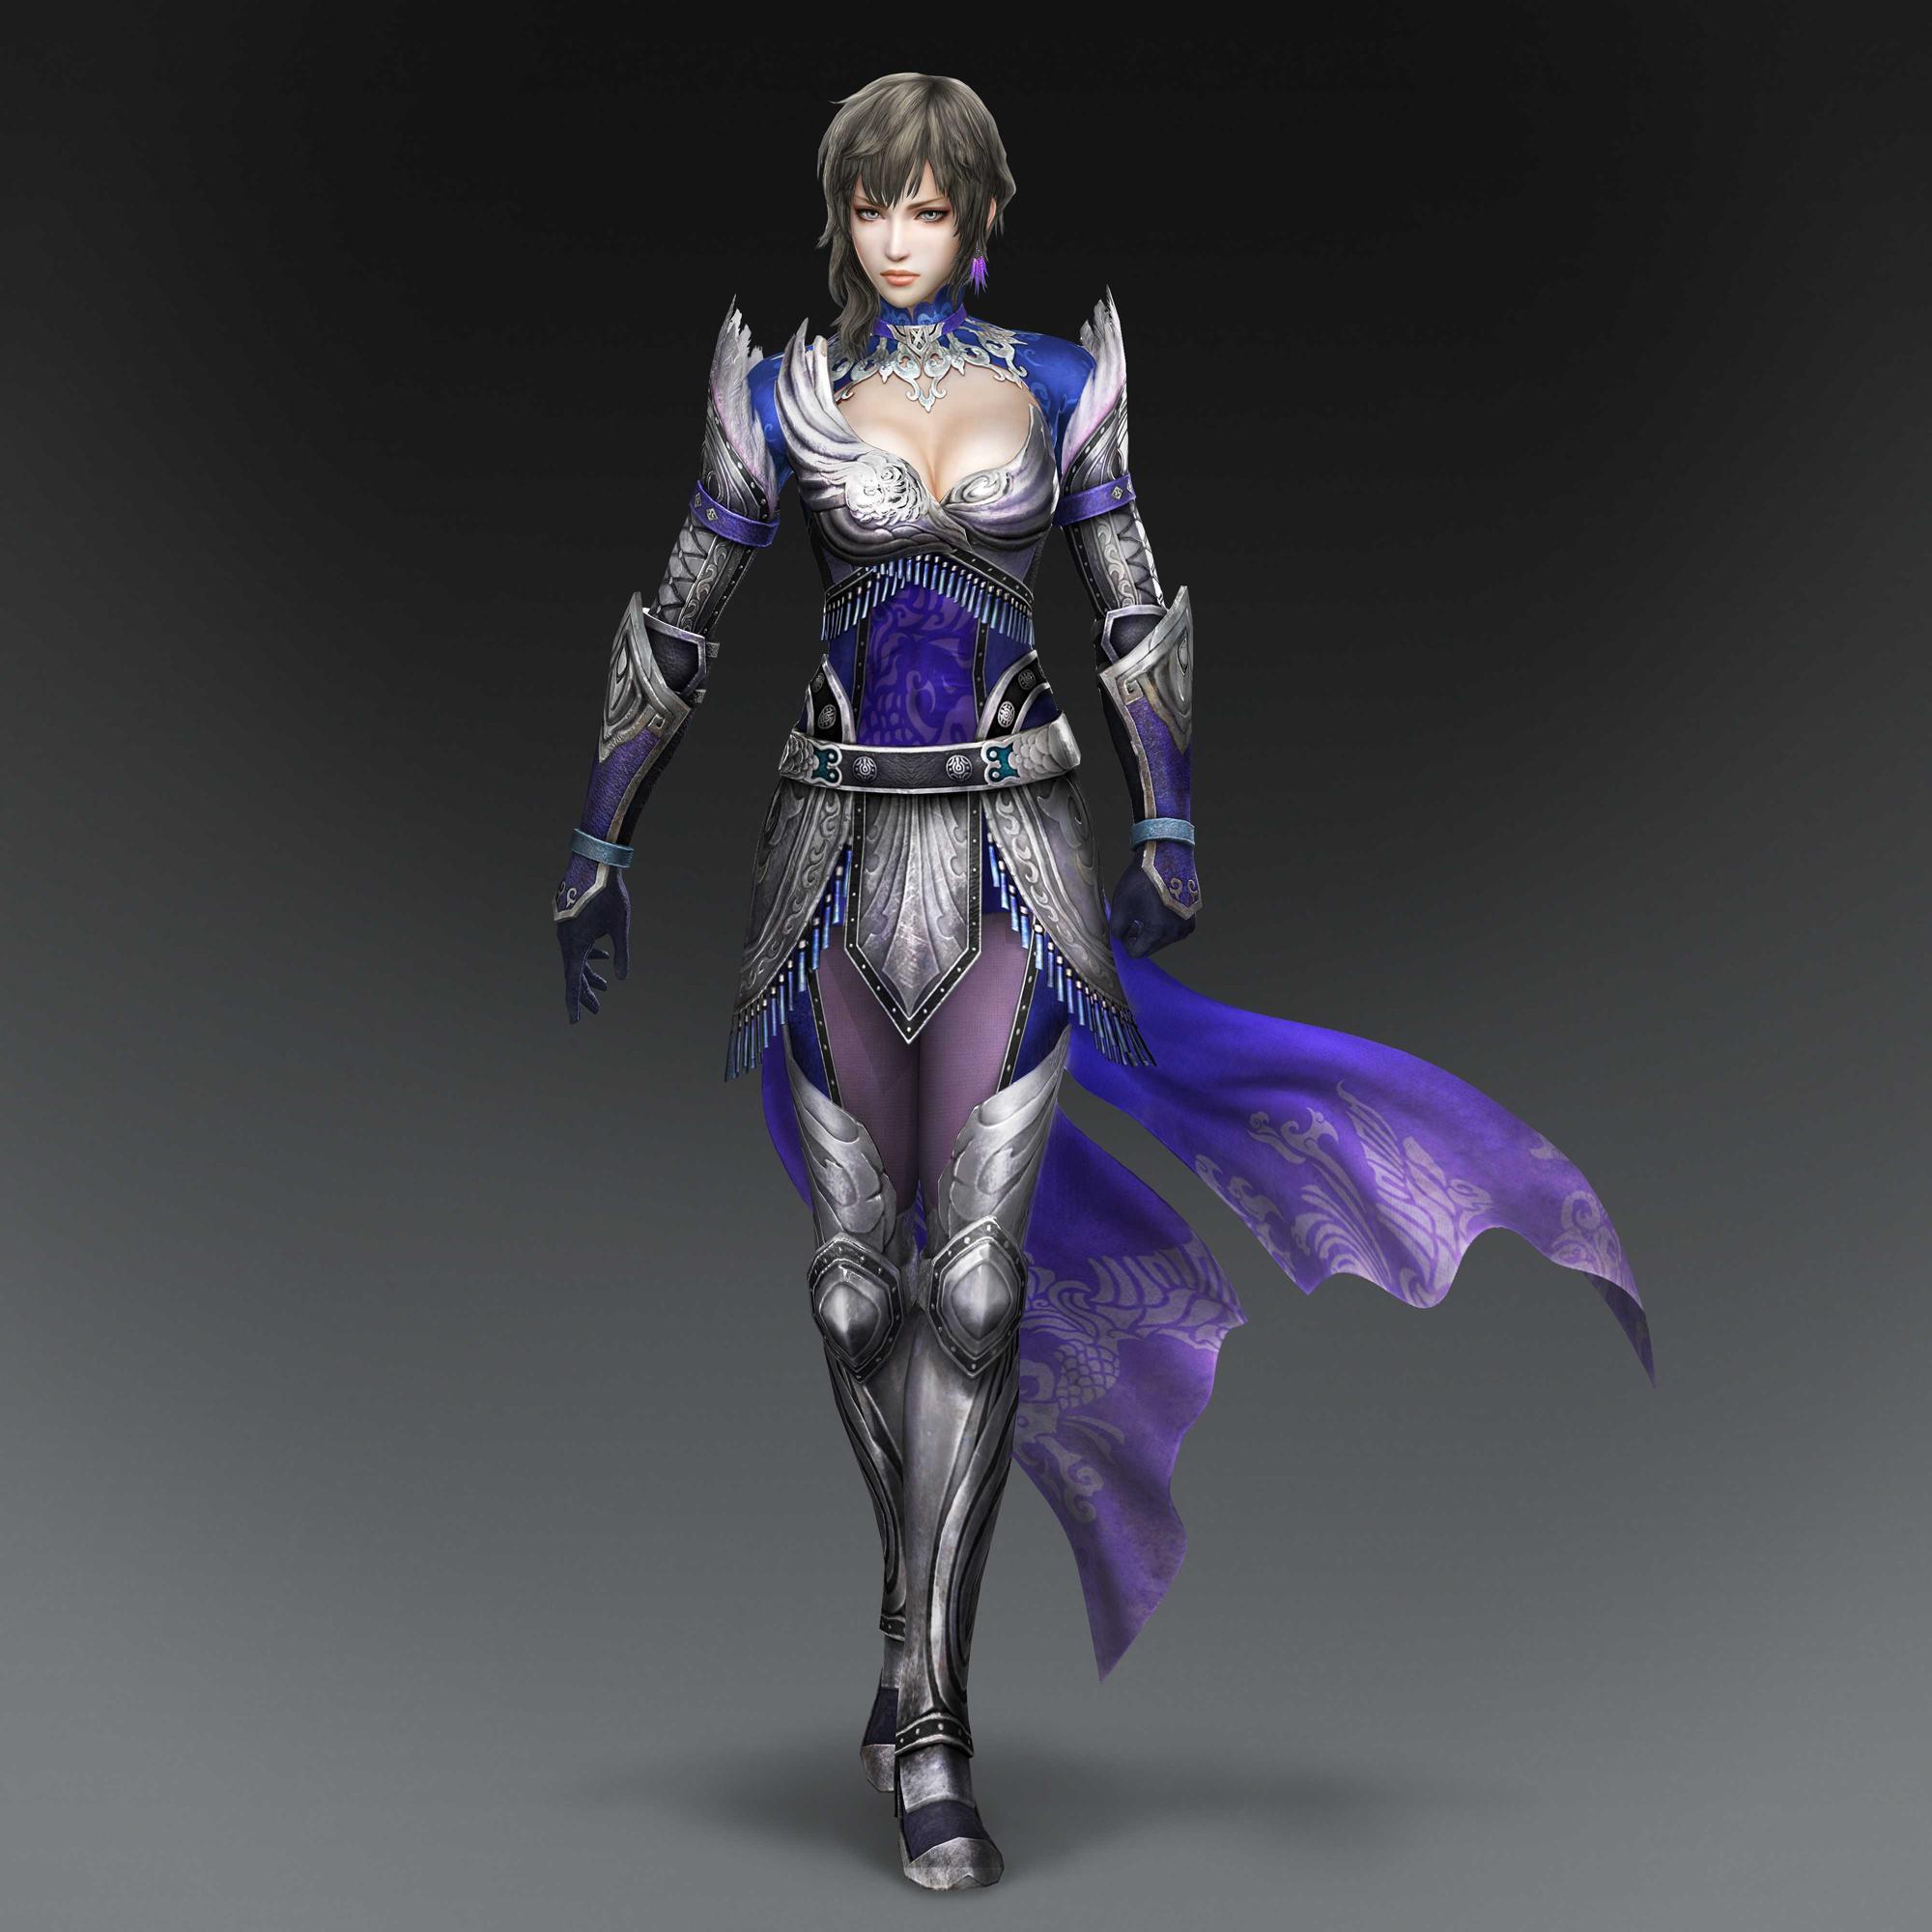 Warriors Orochi 3 Lian Shi: Dynasty Warriors 8 Announced!